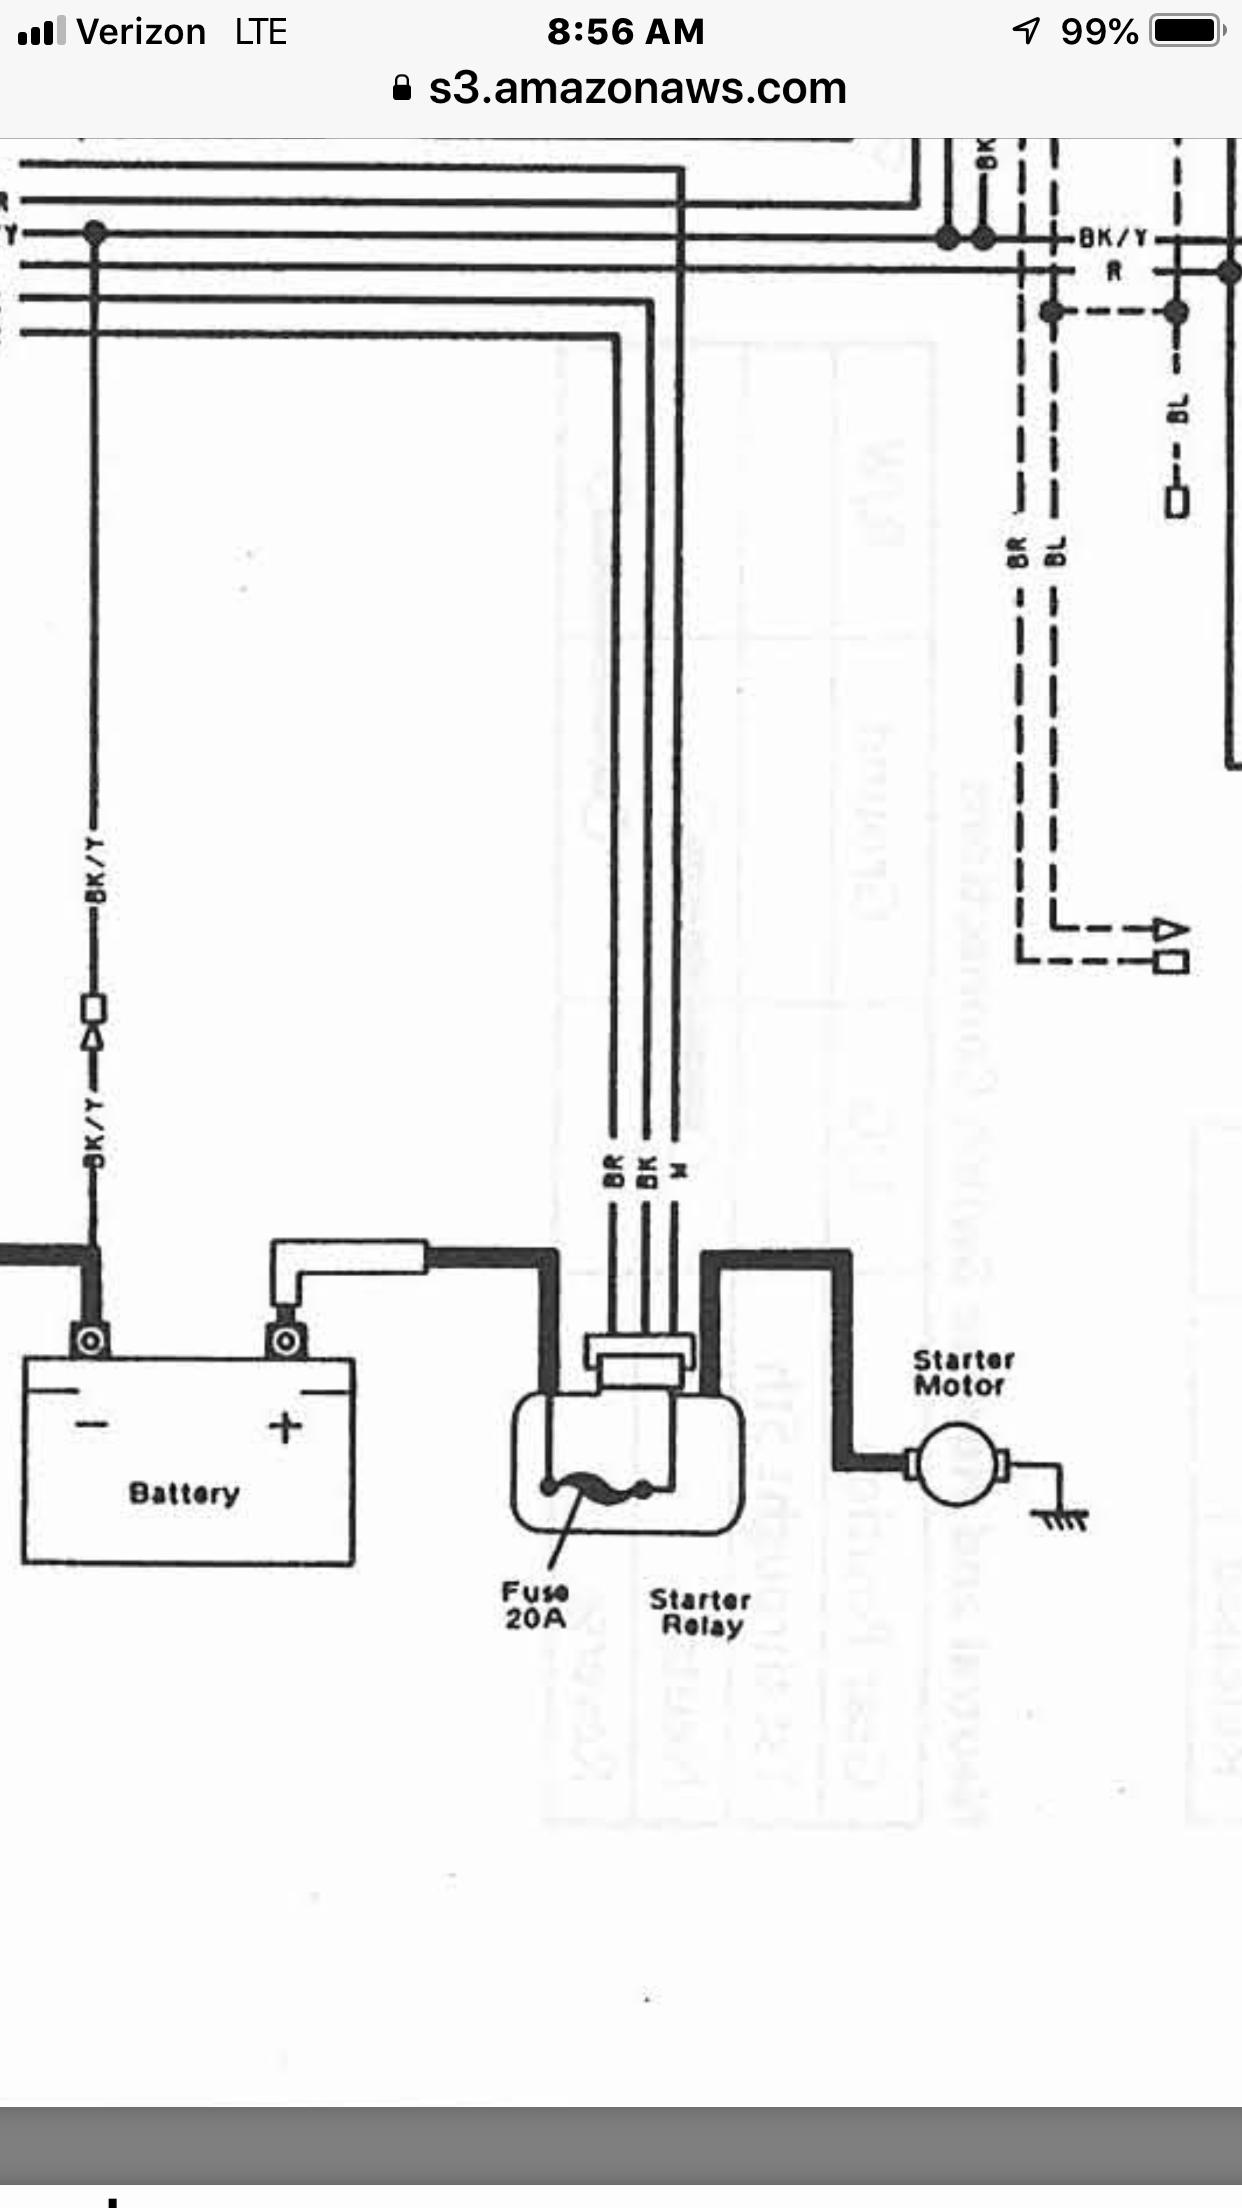 starter wiring diagram kawasaki 220 bayou - wiring diagrams progress-metal  - progress-metal.alcuoredeldiabete.it  al cuore del diabete